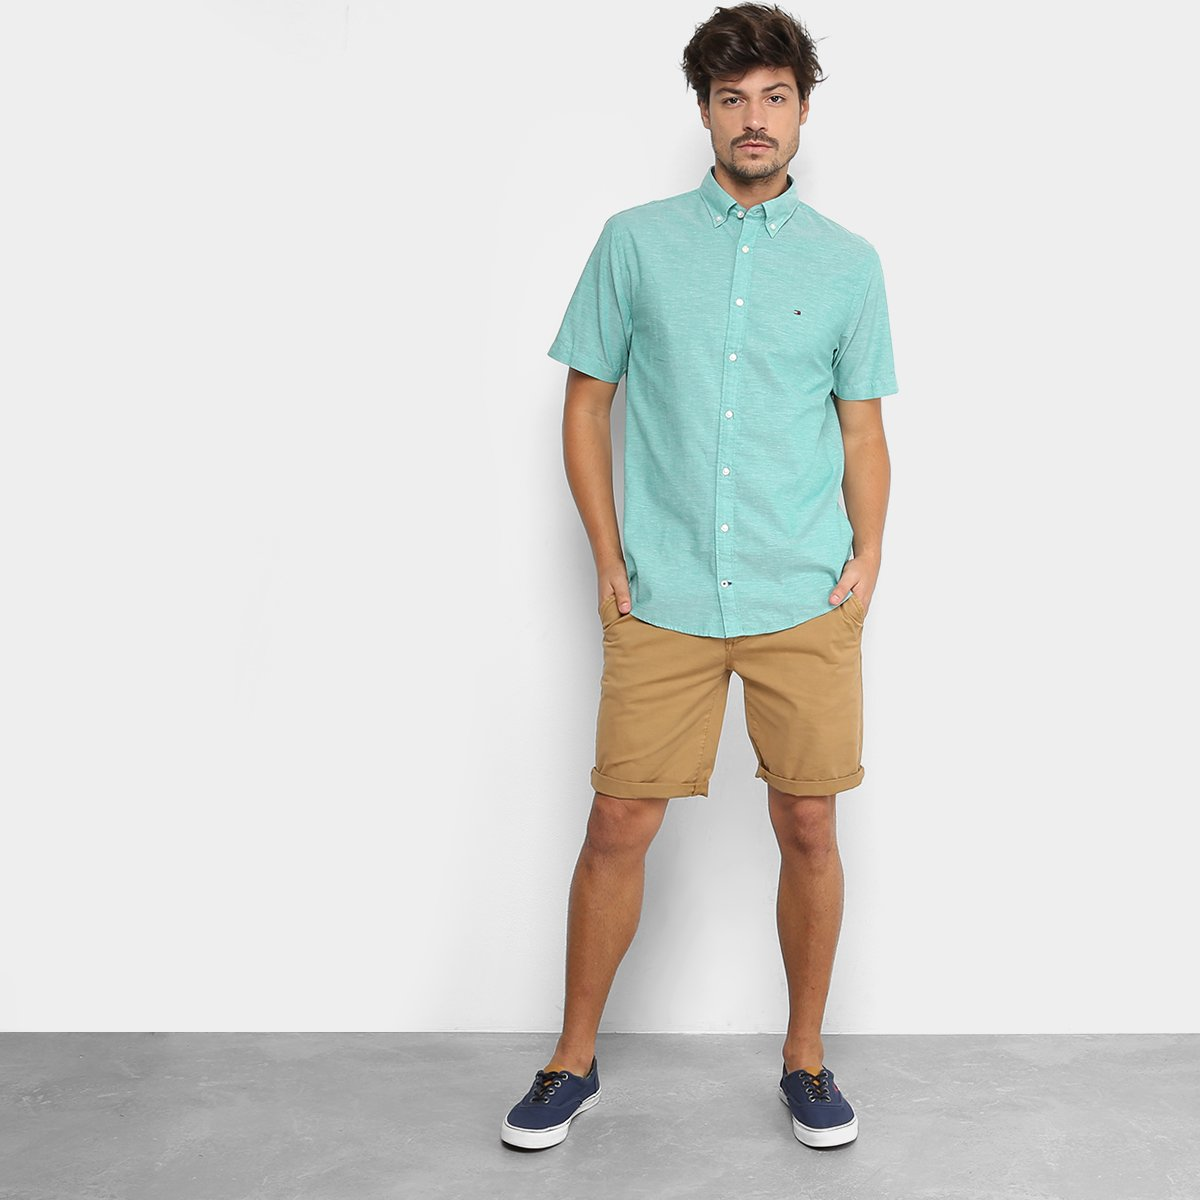 59867ab9cb ... Camisa Manga Curta Tommy Hilfiger Fio A Fio Regular Fit Masculina ...